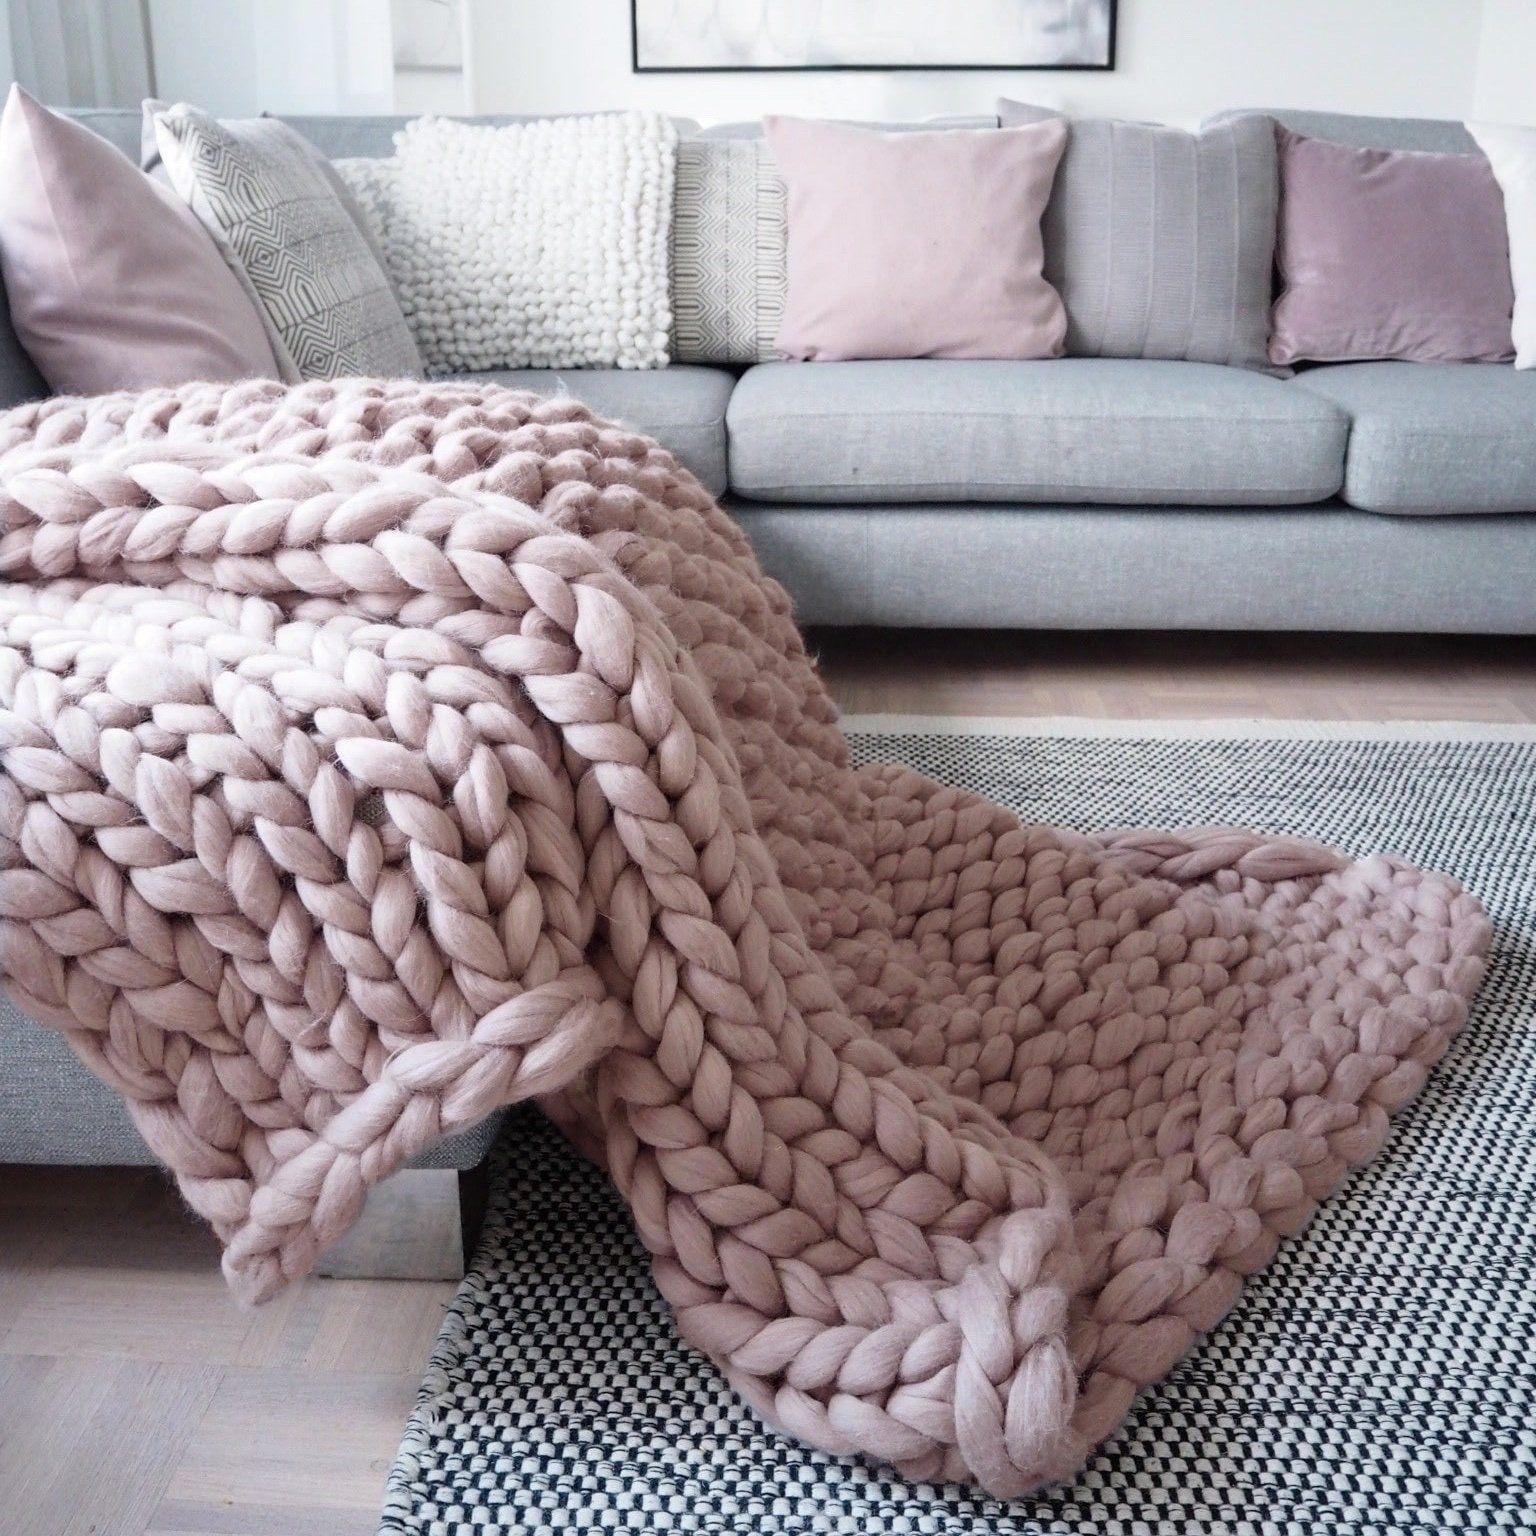 Park Art My WordPress Blog_How Big Is 30x40 Blanket Size